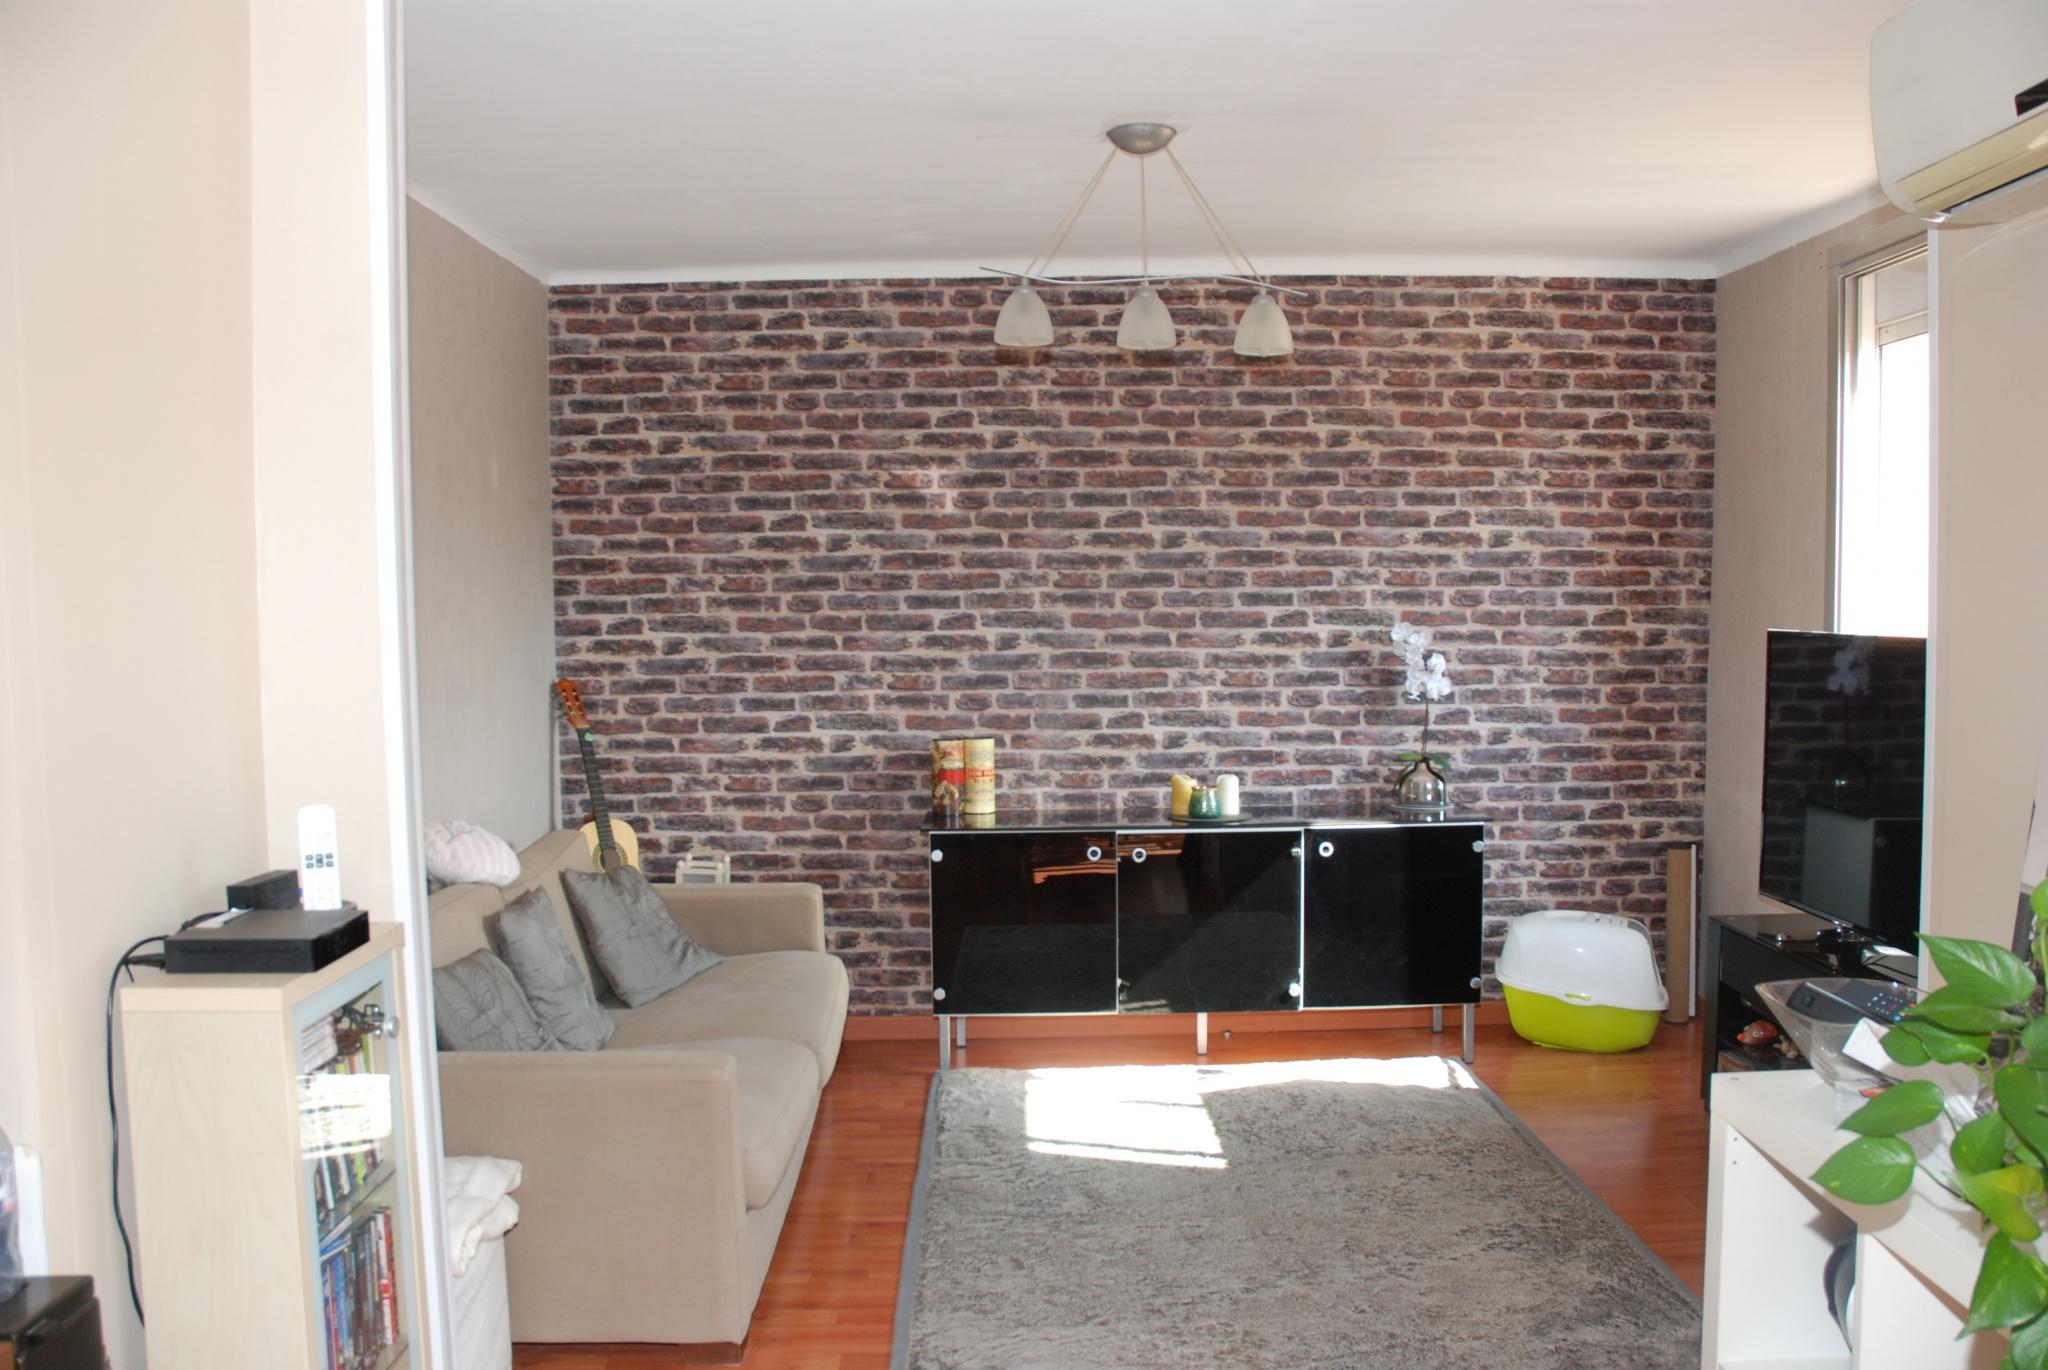 vente appartement aubagne tr s bien situ. Black Bedroom Furniture Sets. Home Design Ideas